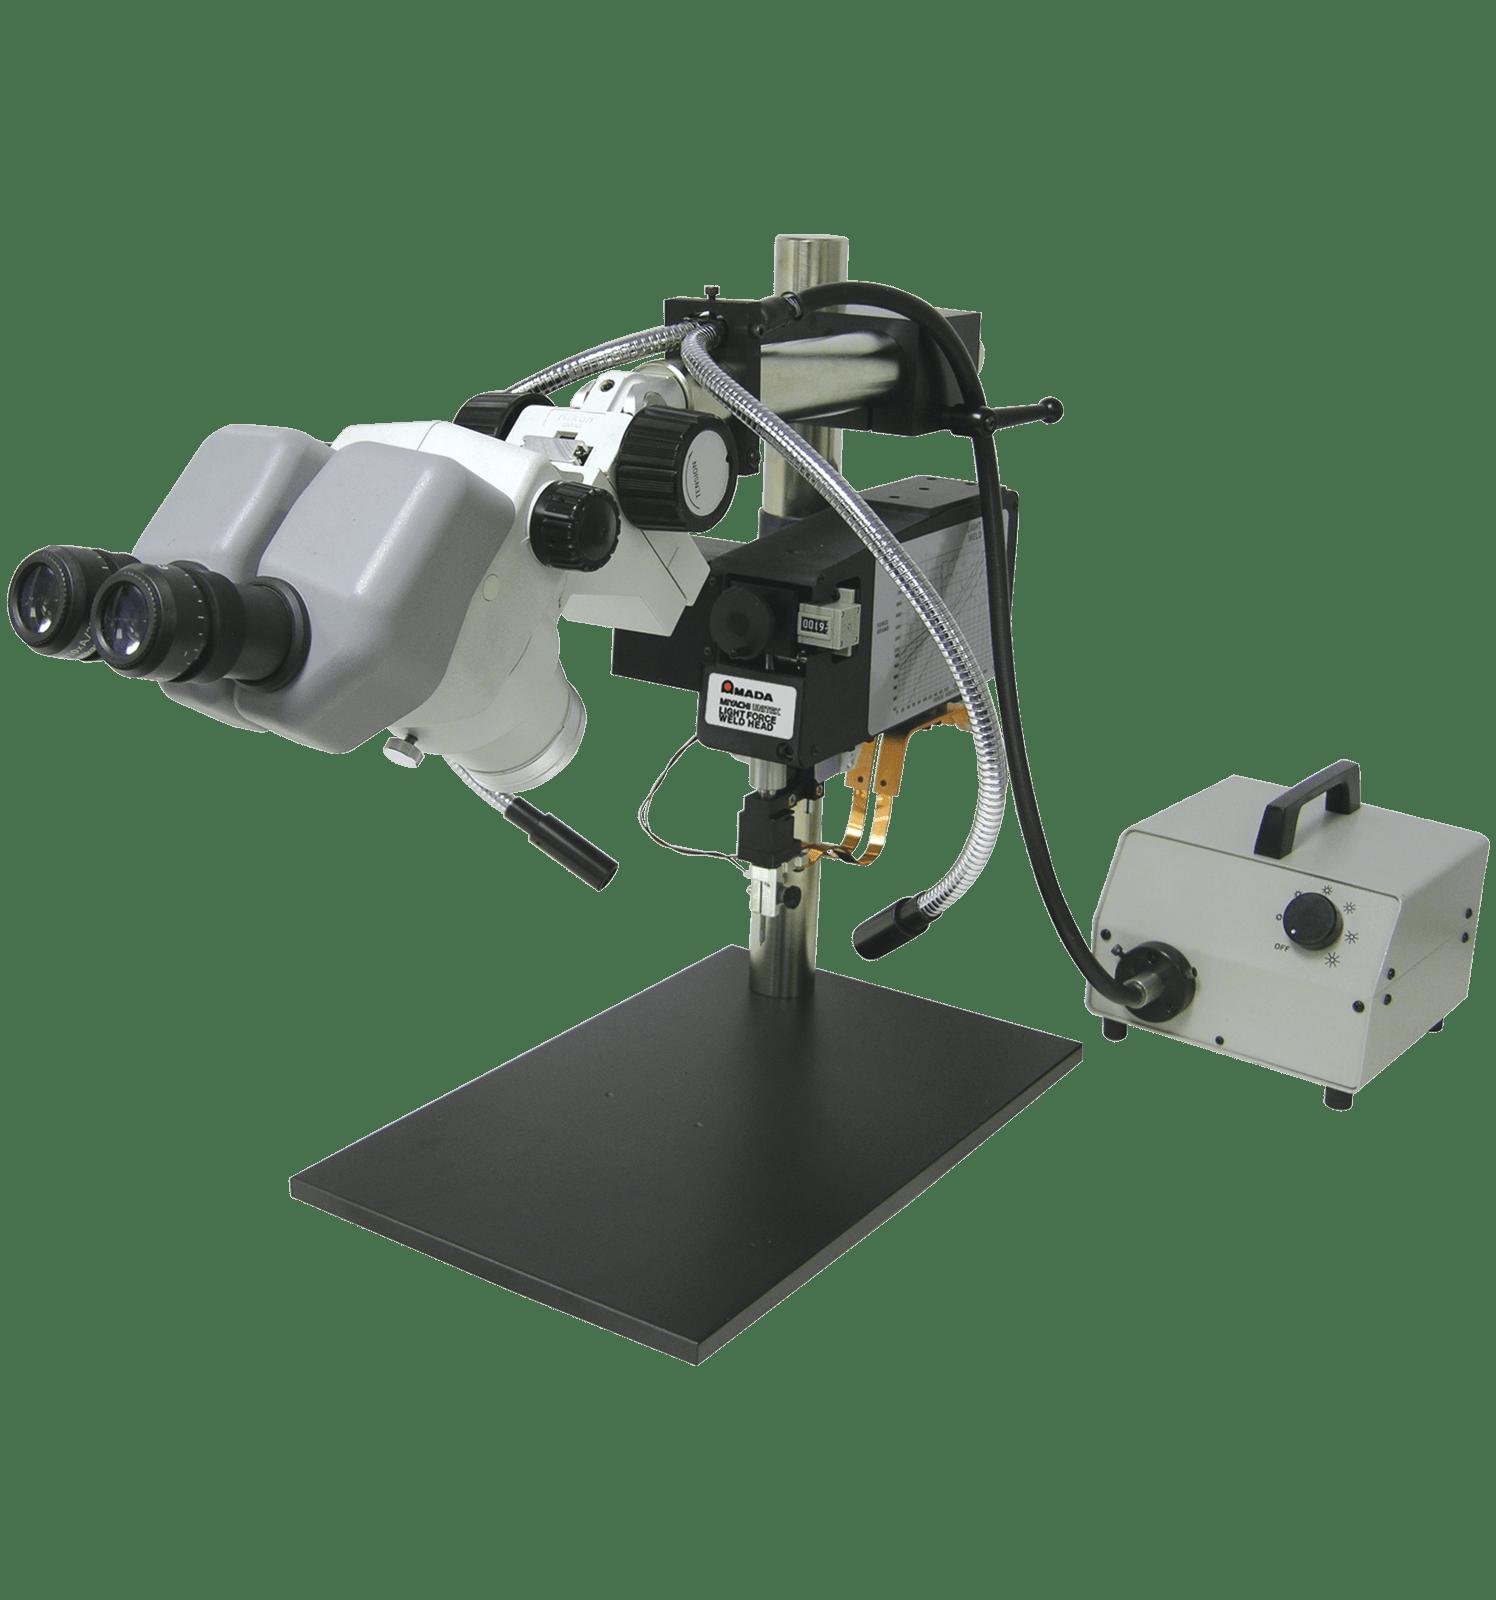 LT-050B-A/UB Light Force Pneumatic Weld Head - Parallel Gap Electrodes